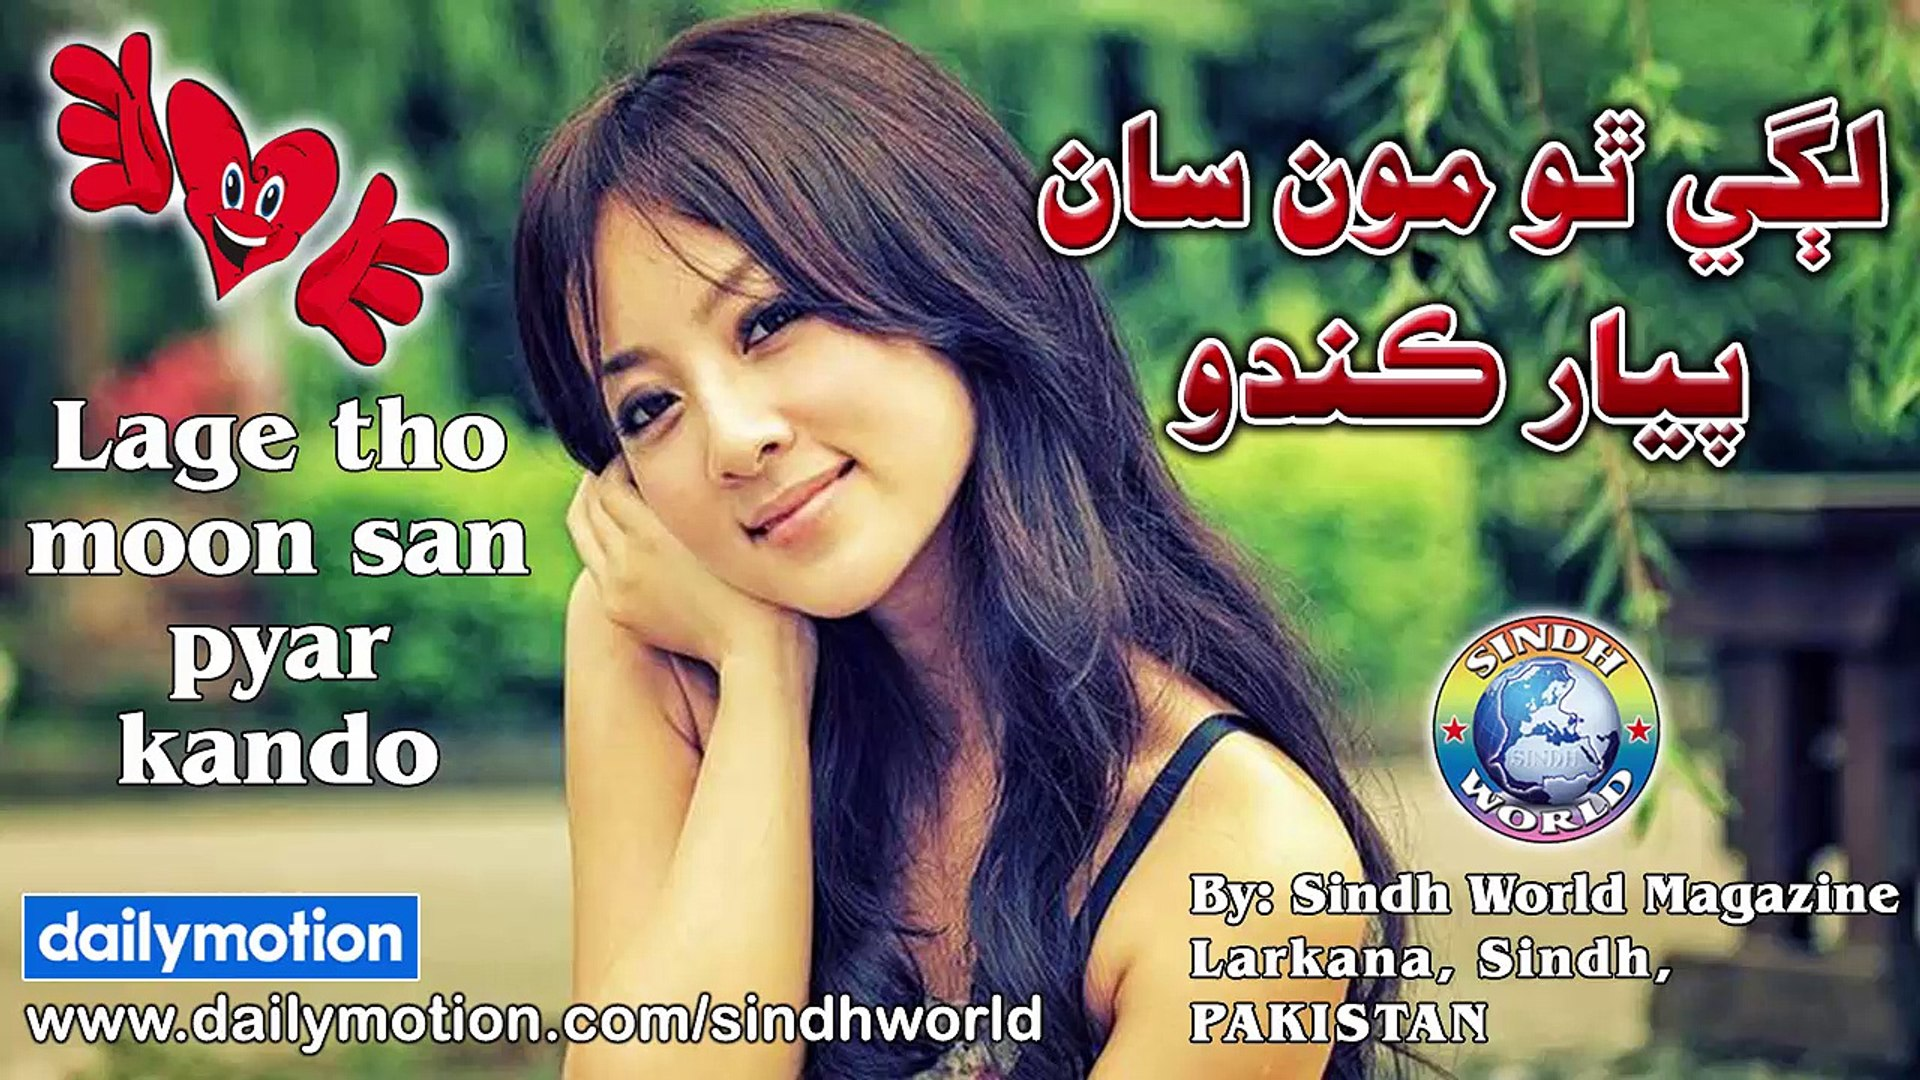 Lage Tho Moonsan Pyar Kando | Sindhi Songs 2018 | New Album | Dance Song |  Remix Songs | Music | HD Songs | Sindh World